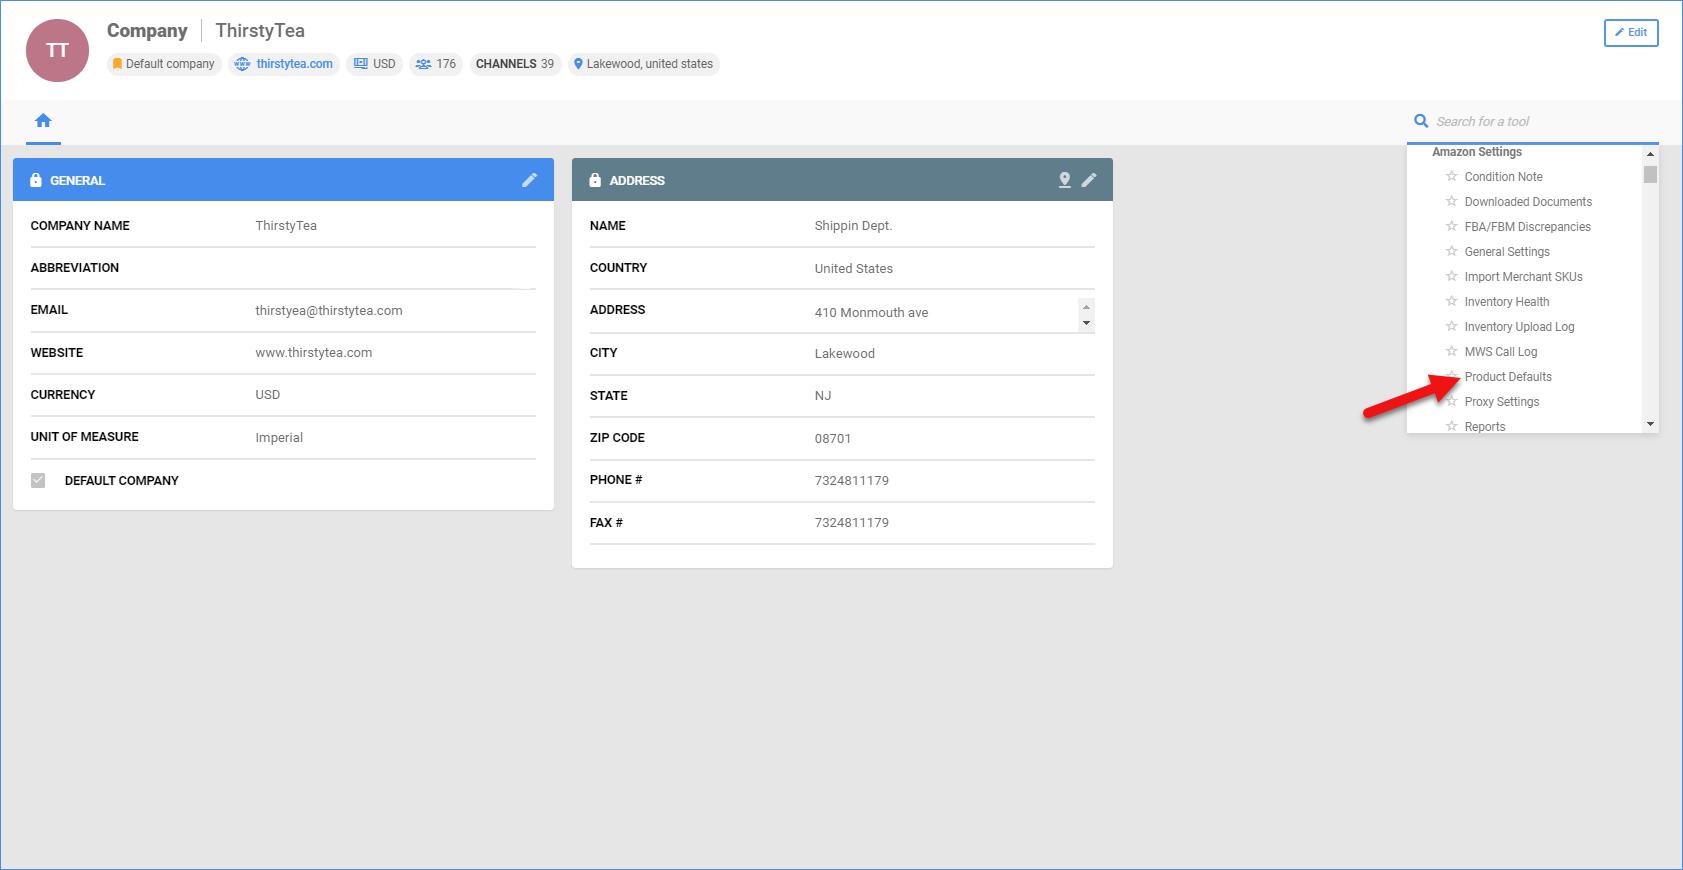 sellercloud company amazon settings product defaults